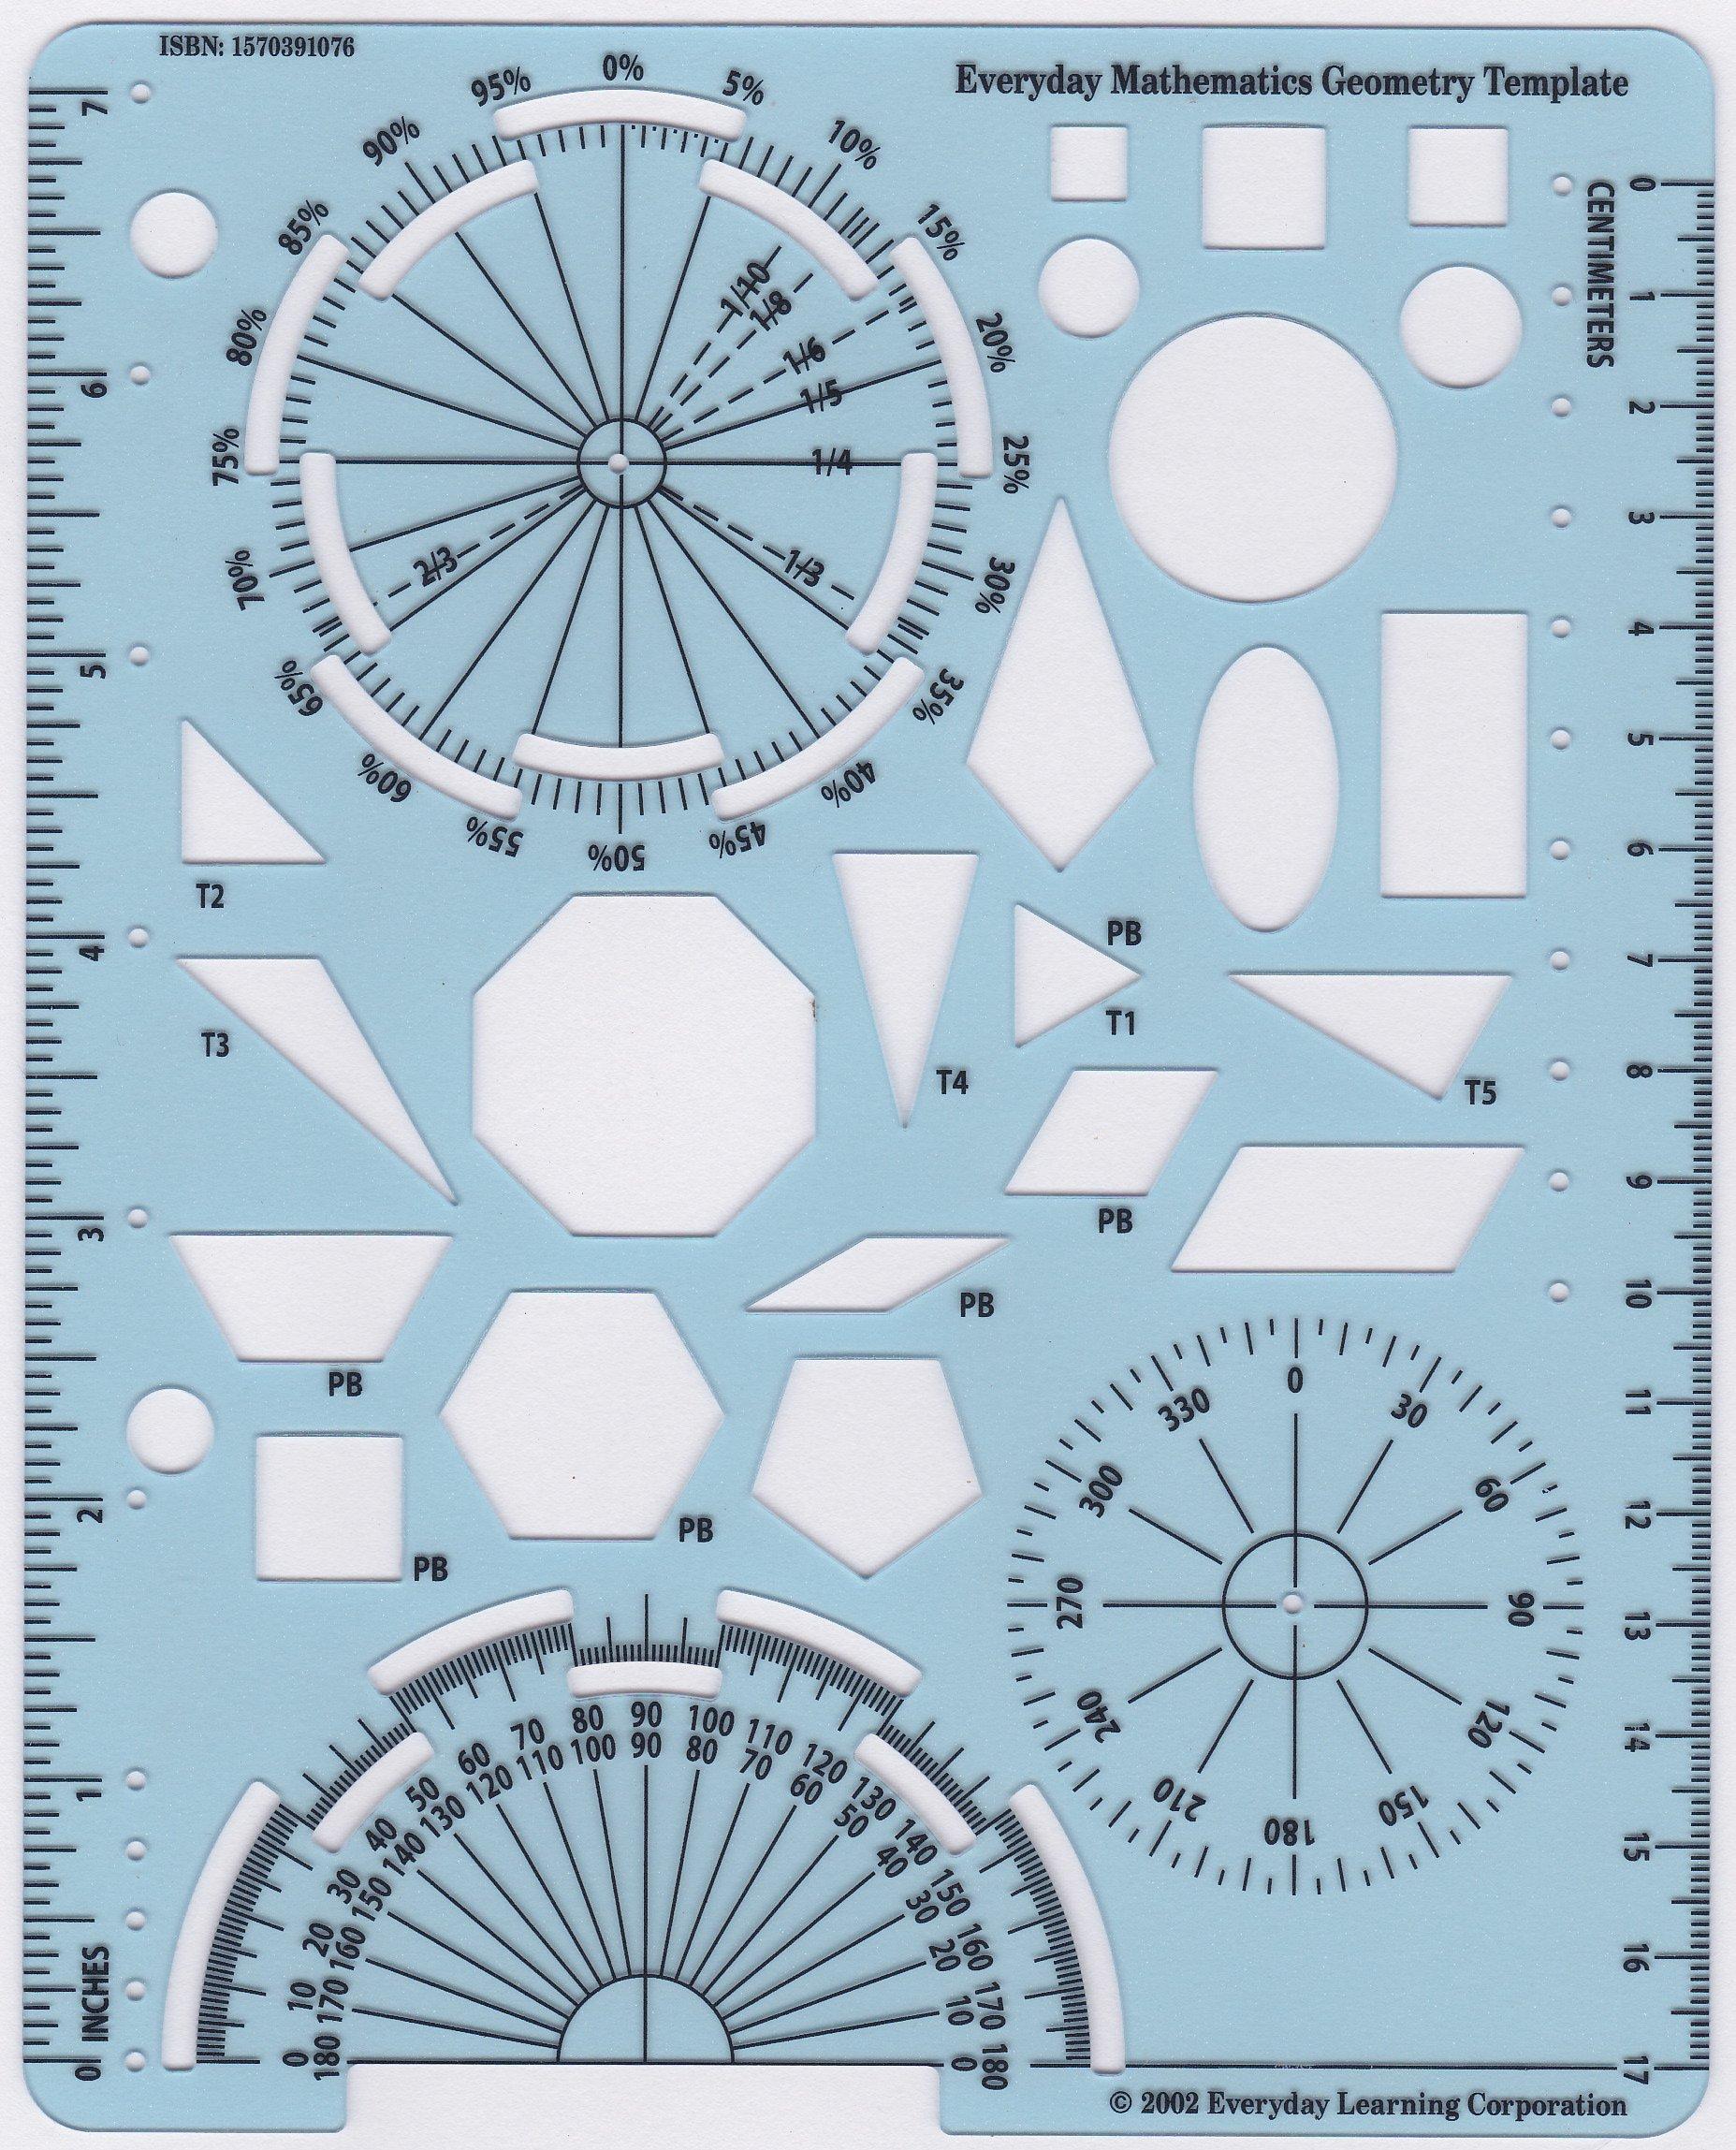 Everyday Mathematics: Geometry Template: University of Chicago